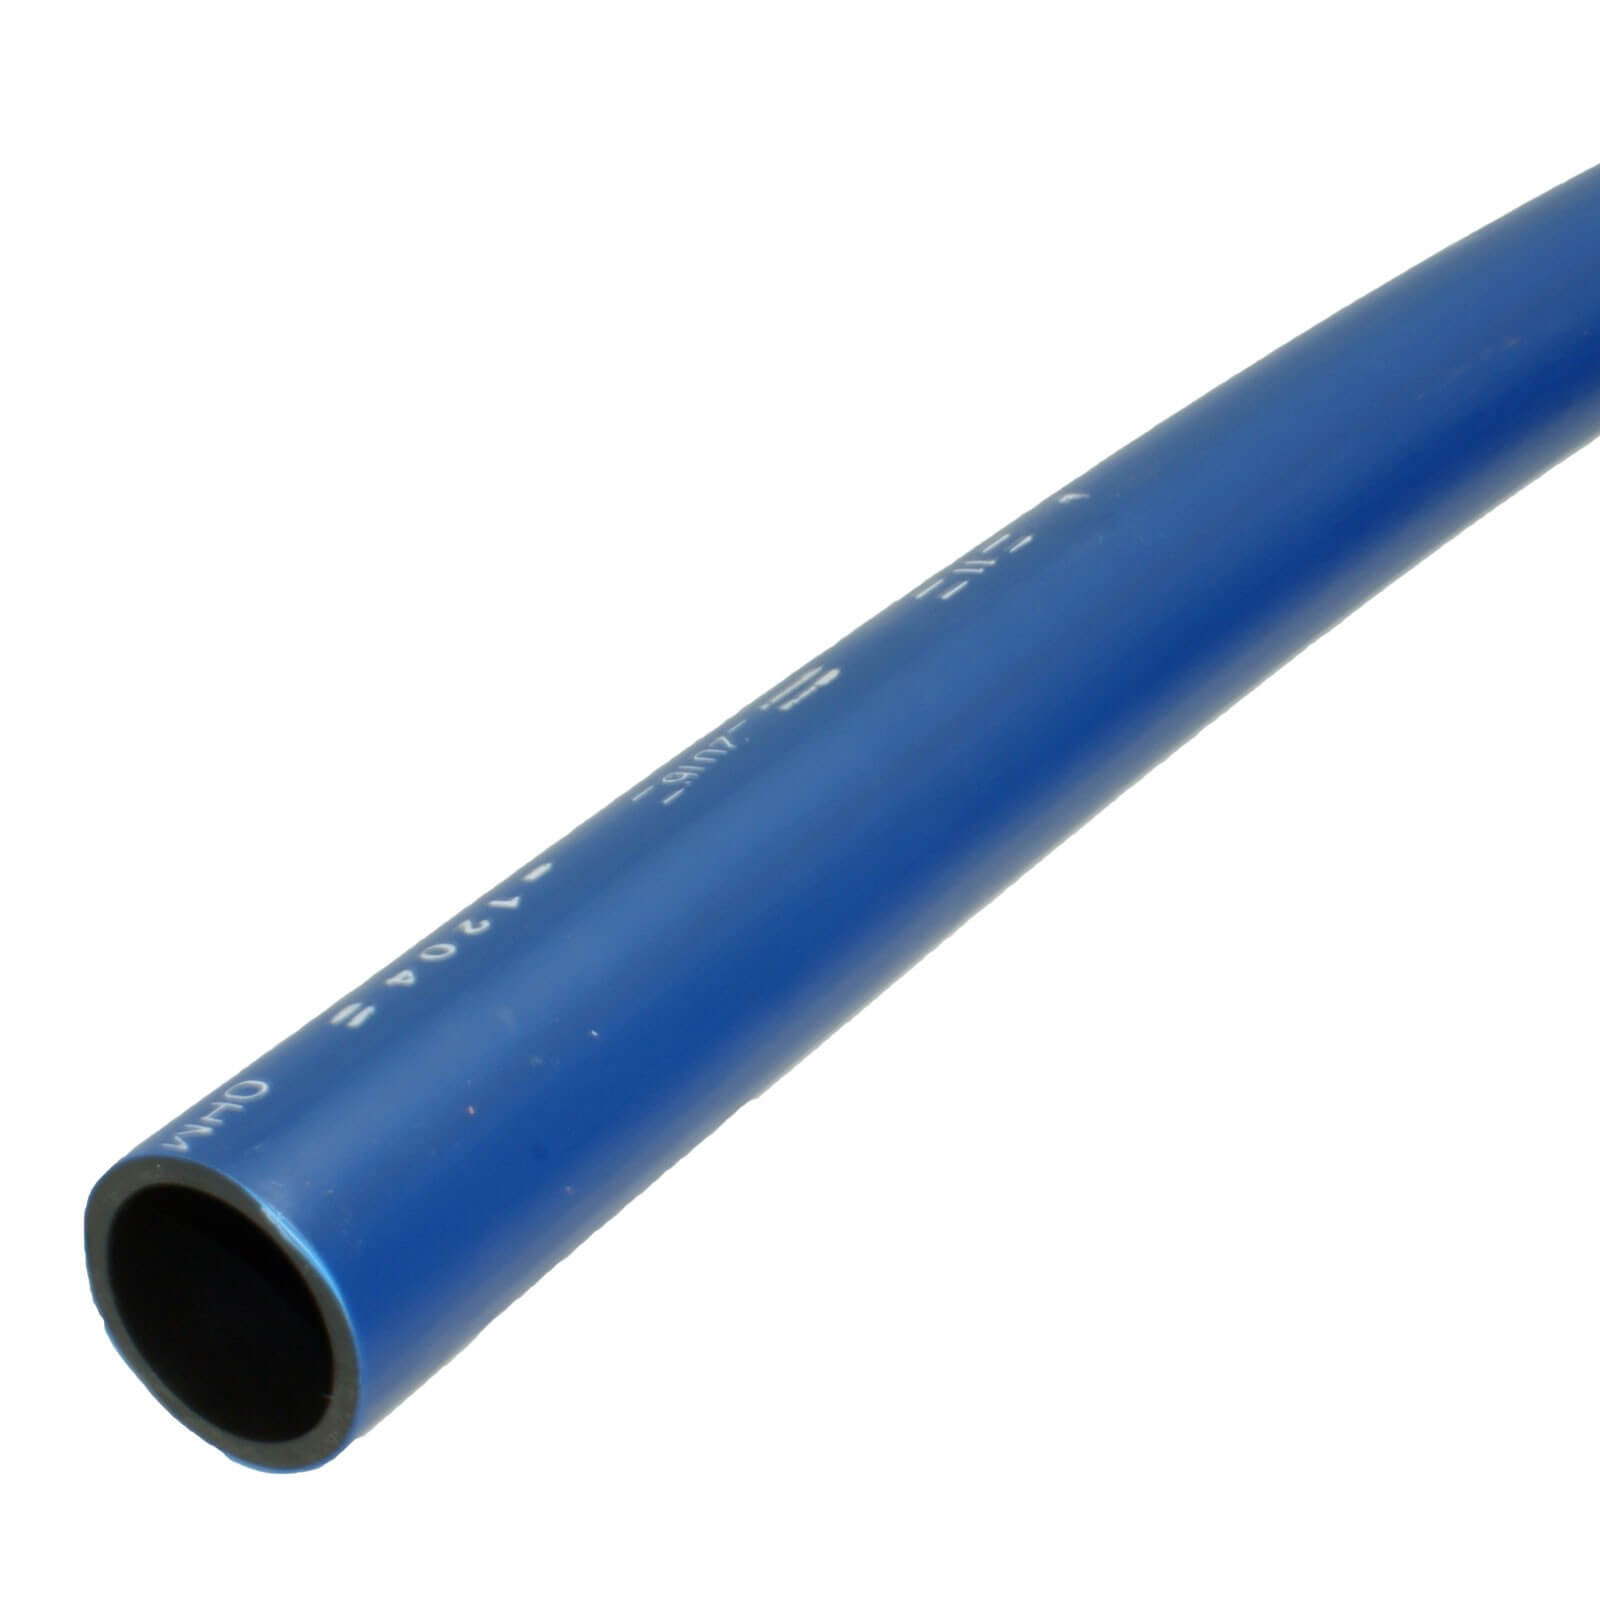 pe rc rohr pe100 pn16 100m 1 zoll 32mm trinkwasser blau. Black Bedroom Furniture Sets. Home Design Ideas